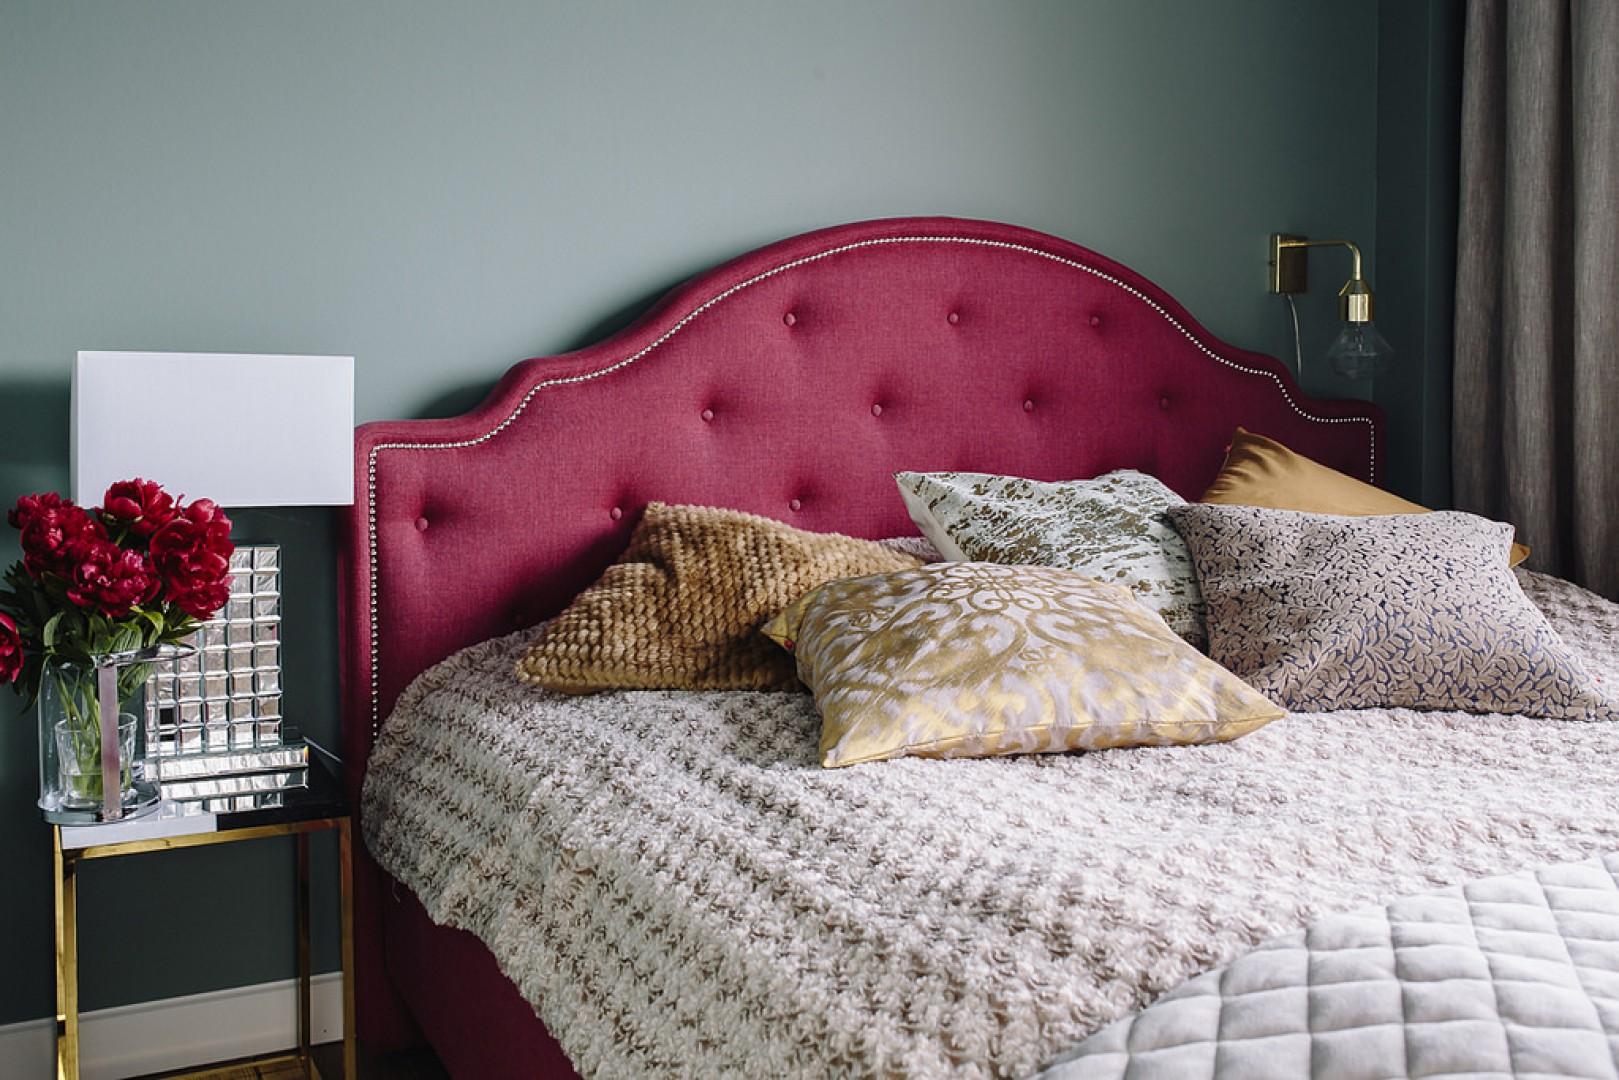 Łóżko Flores firmy Wajnert Meble po metamorfozie sypialni Urszuli Michalak. Fot. Interiors Design Blog